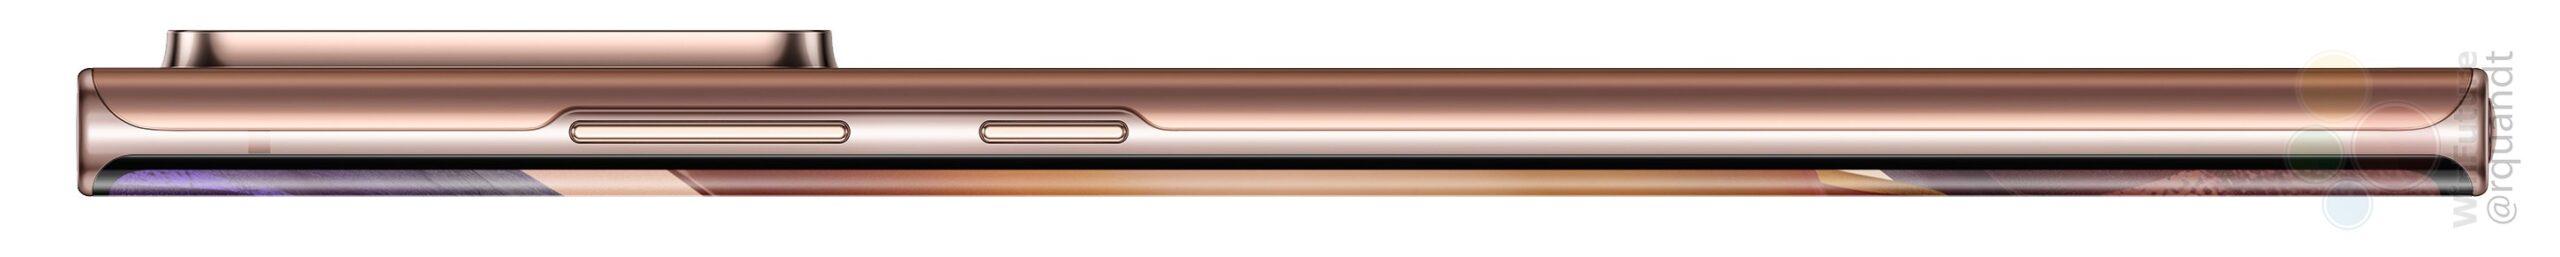 Samsung-Galaxy-Note-20-Ultra-zoom